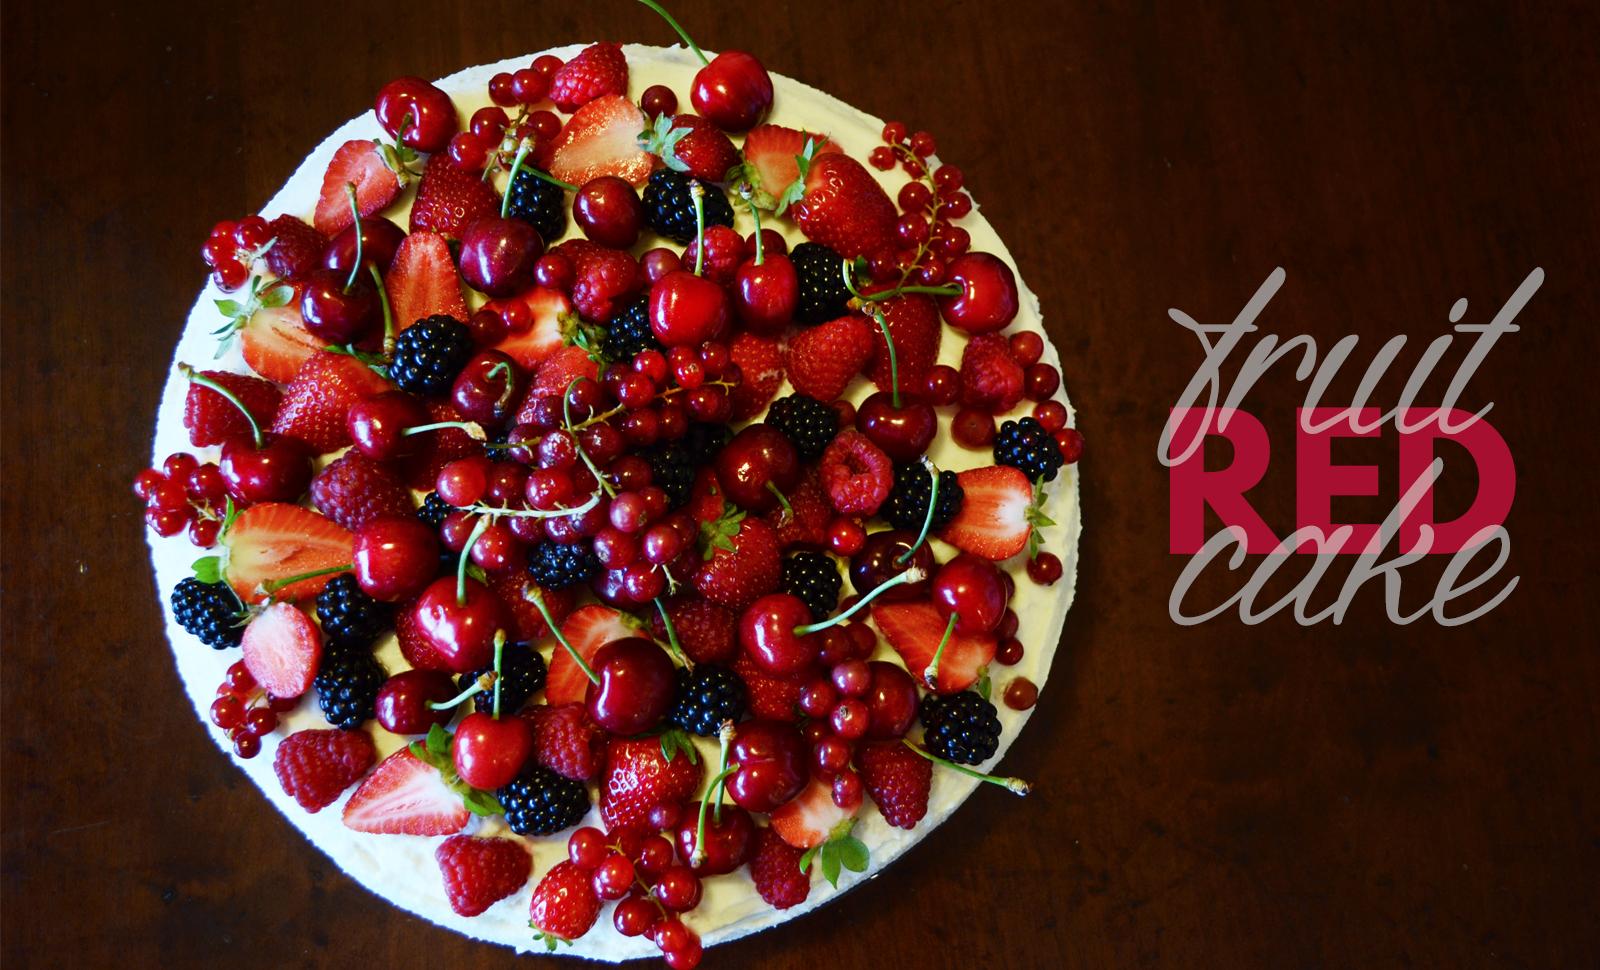 Idee Per Decorare Una Torta nuove idee per una torta decorata alla frutta - tweedot blog